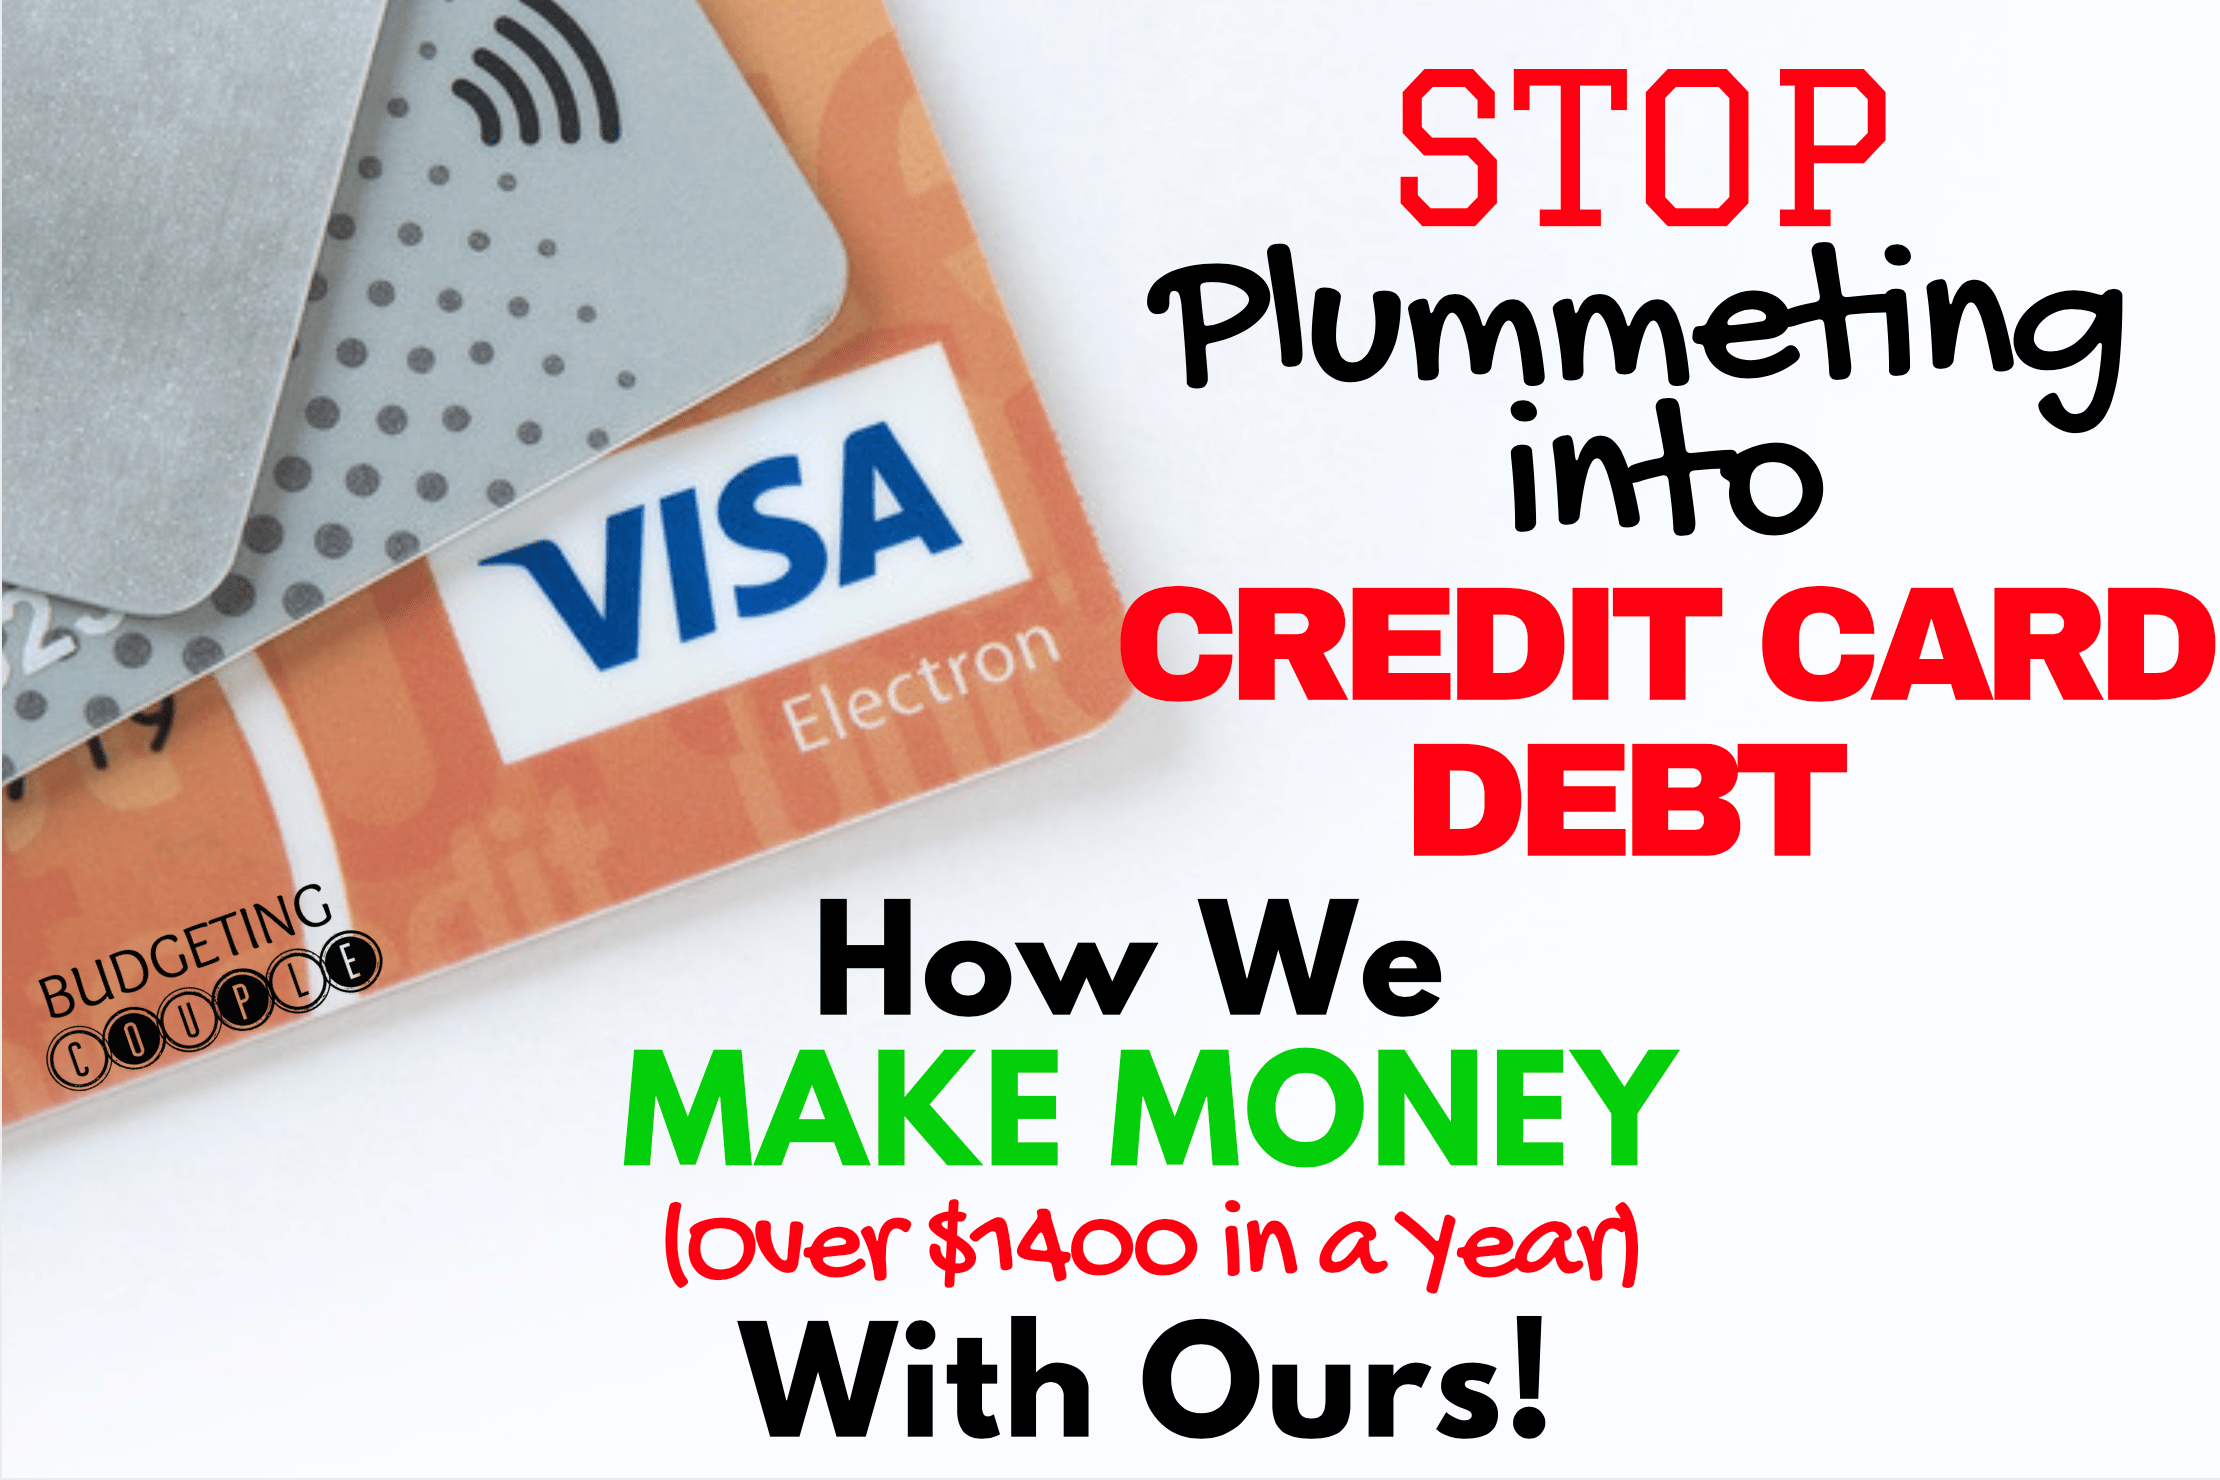 credit card debt, credit card debt tips, credit card debt payoff, make money, make money with credit cards